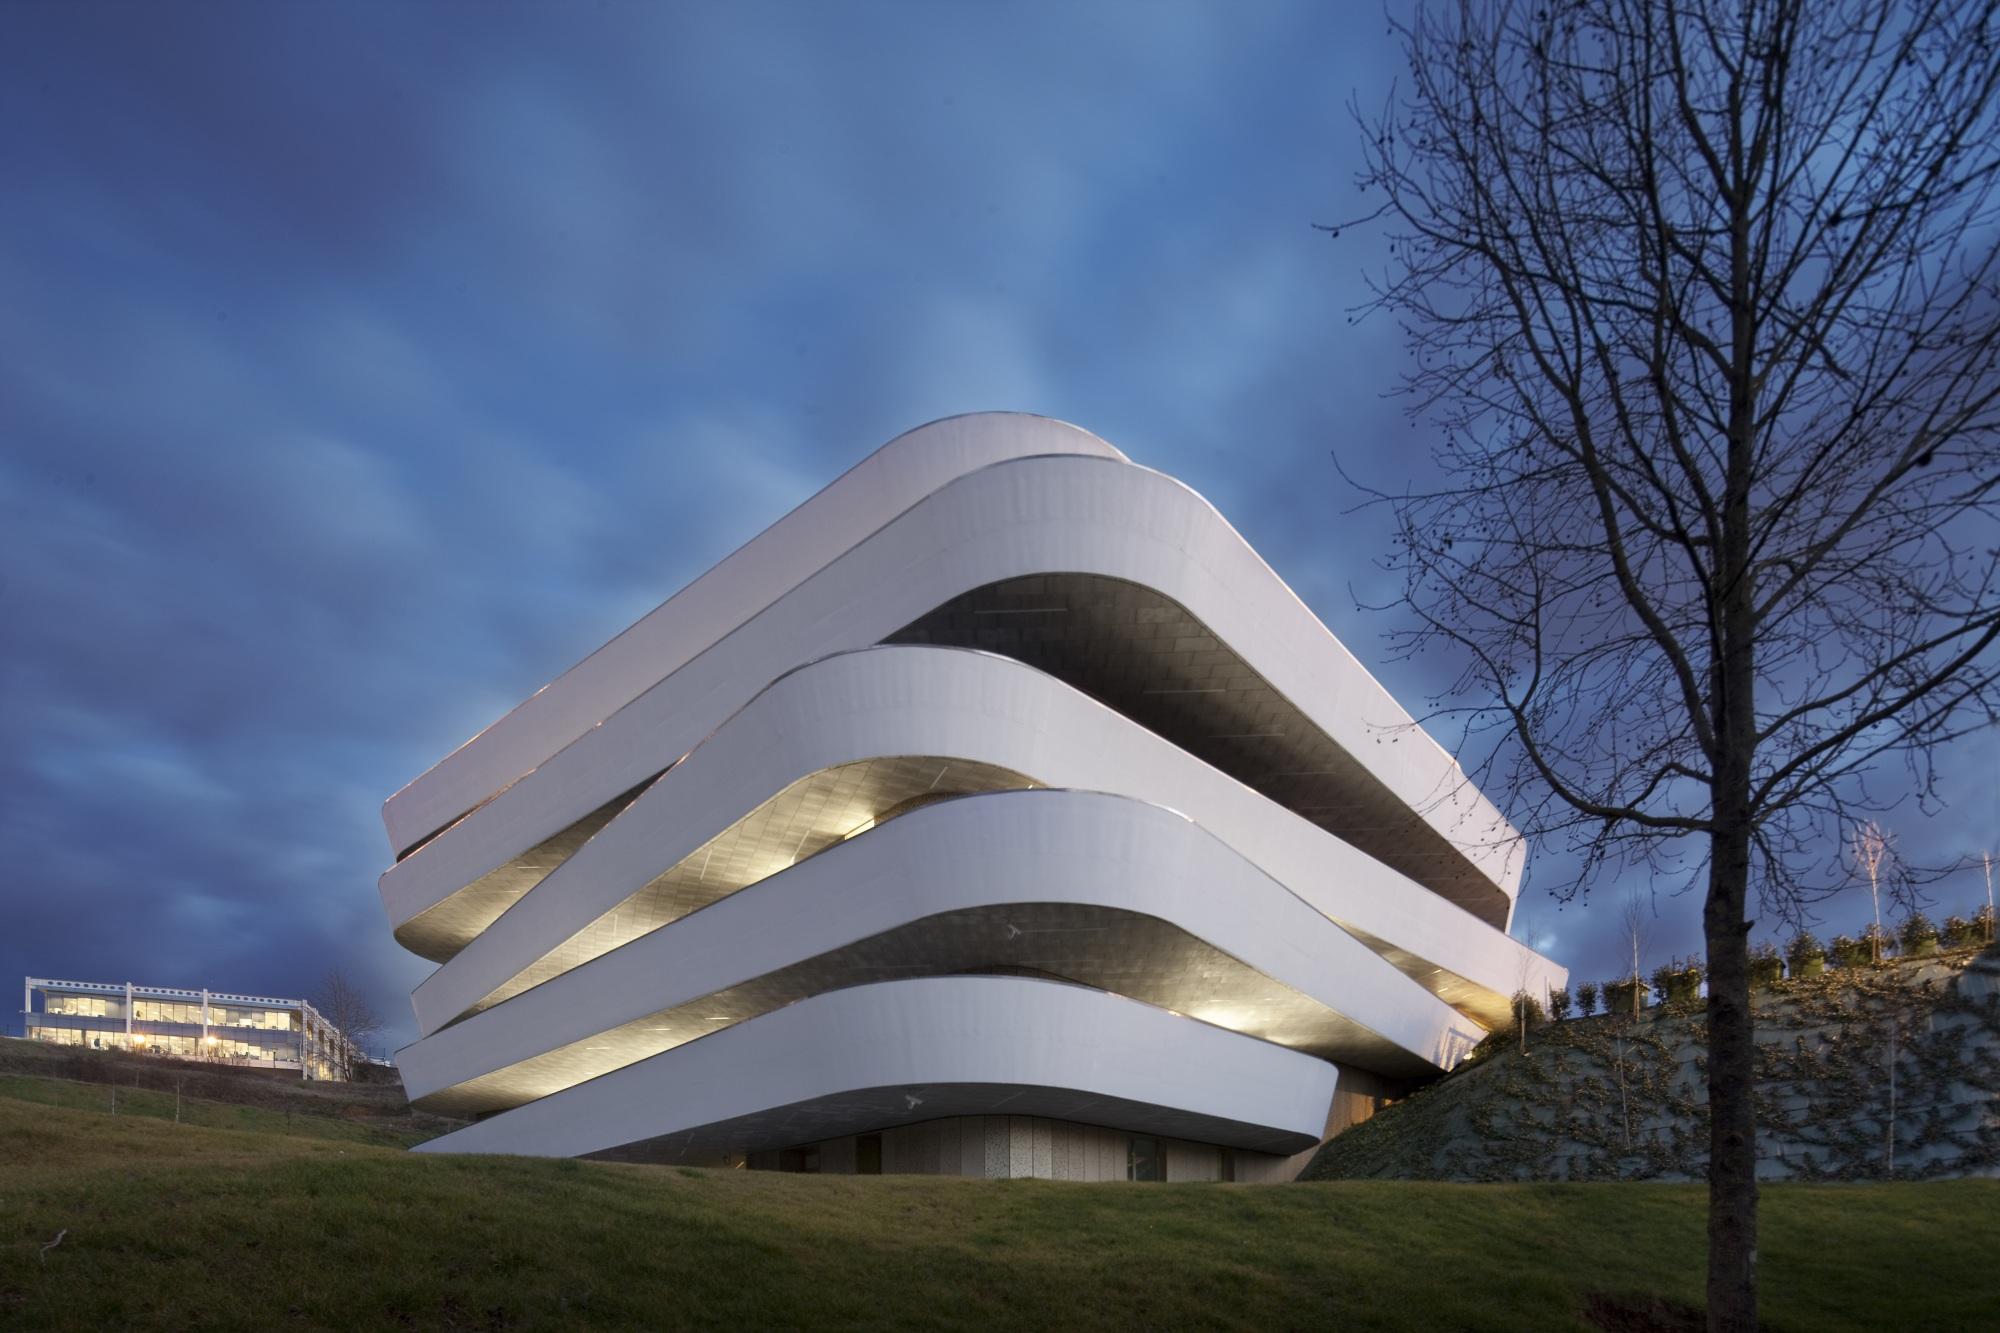 Basque Culinary Center — Enea Design